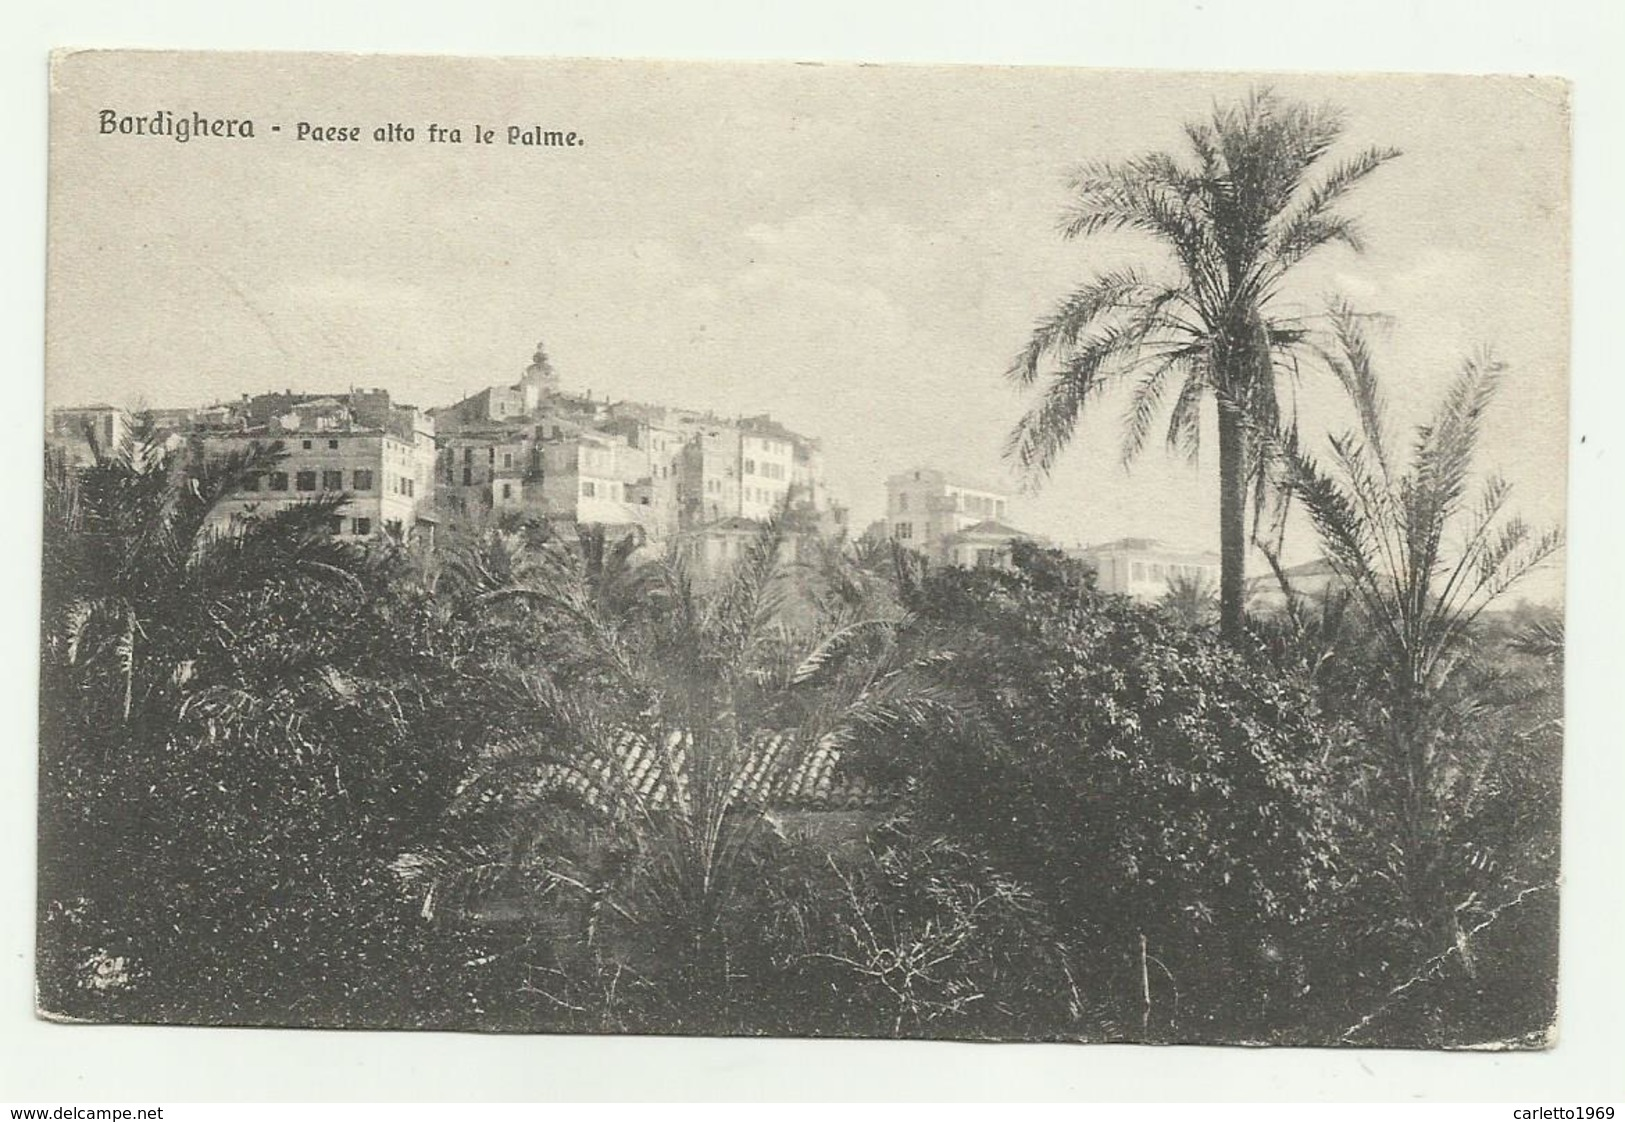 BORDIGHERA - PAESE ALTO FRA LE PALME - NV  FP - Imperia